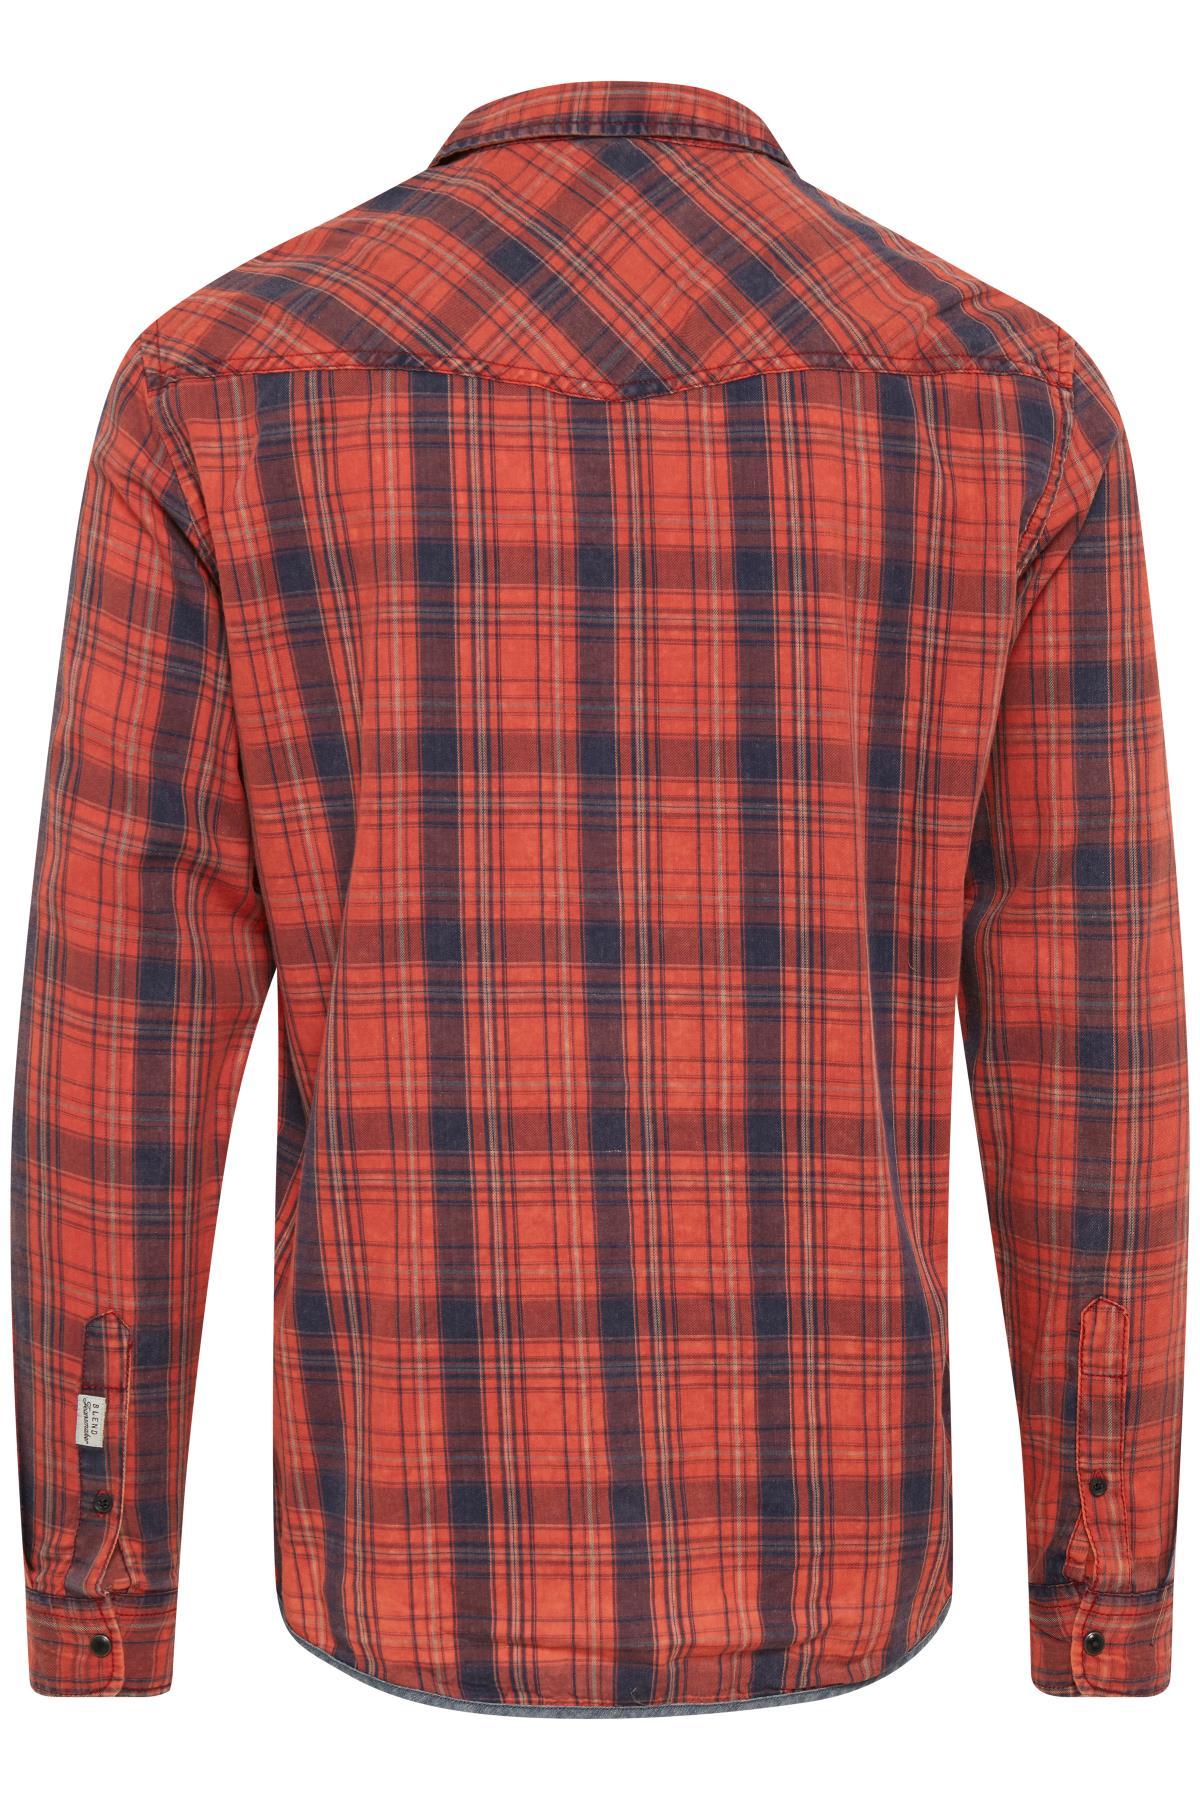 Tandori Red Langærmet skjorte – Køb Tandori Red Langærmet skjorte fra str. S-XXL her